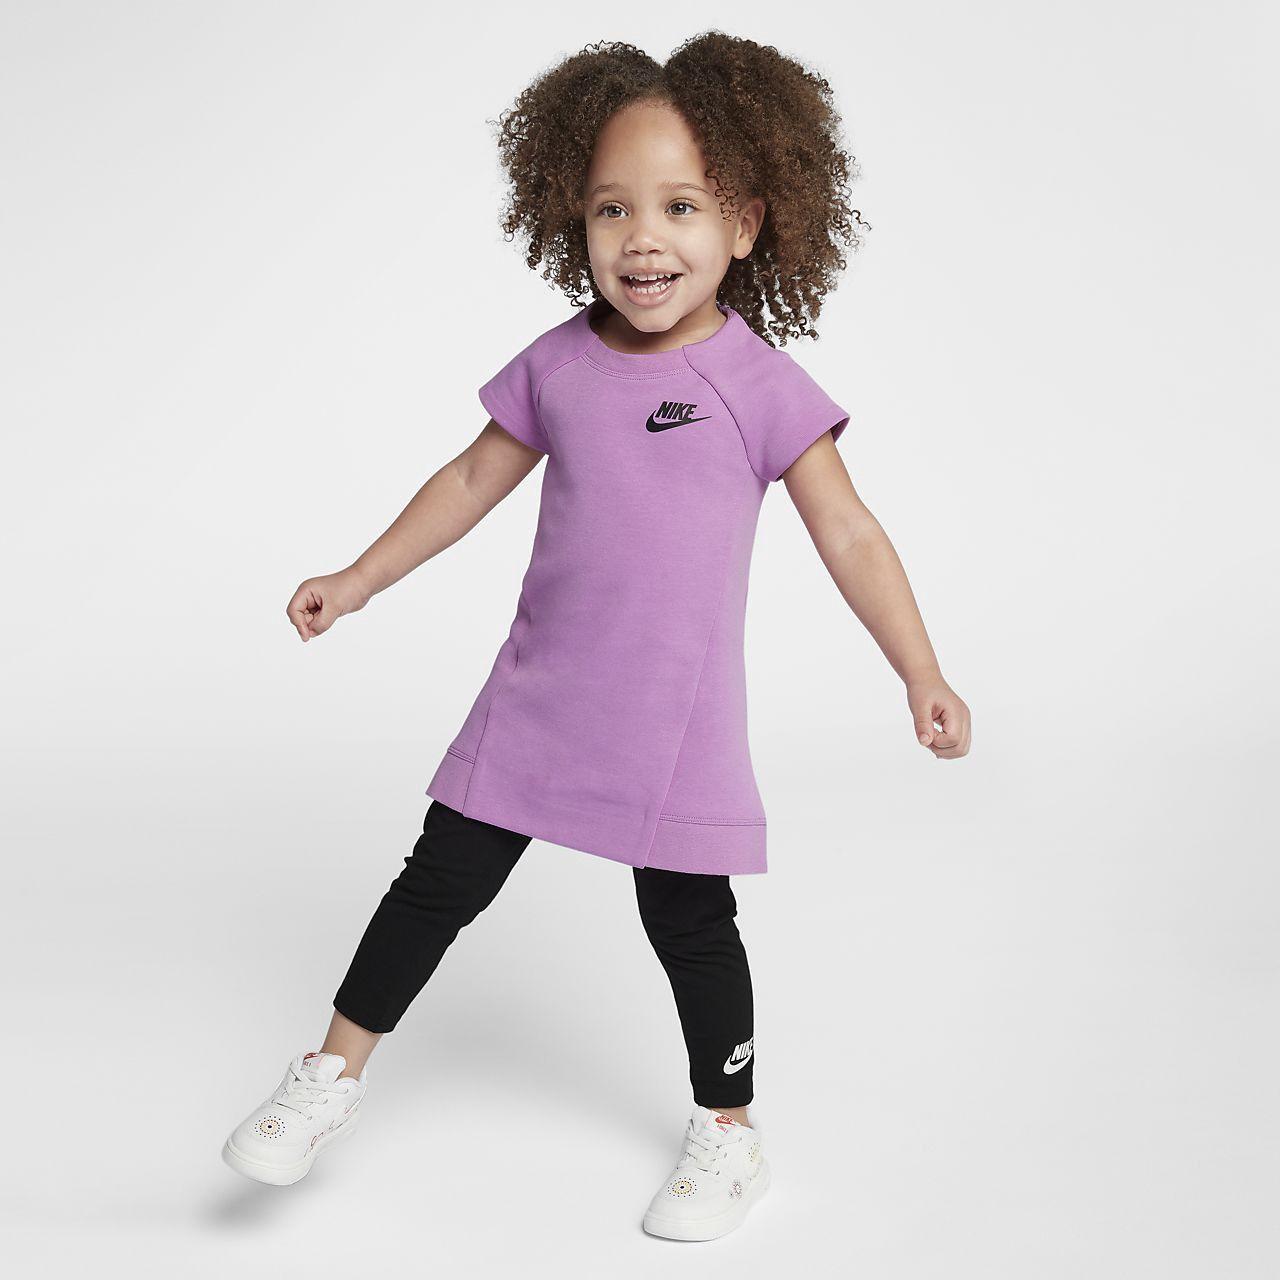 78e71c078 Nike Tech Fleece Two-Piece Toddler Girls' Set - 2T   Products ...